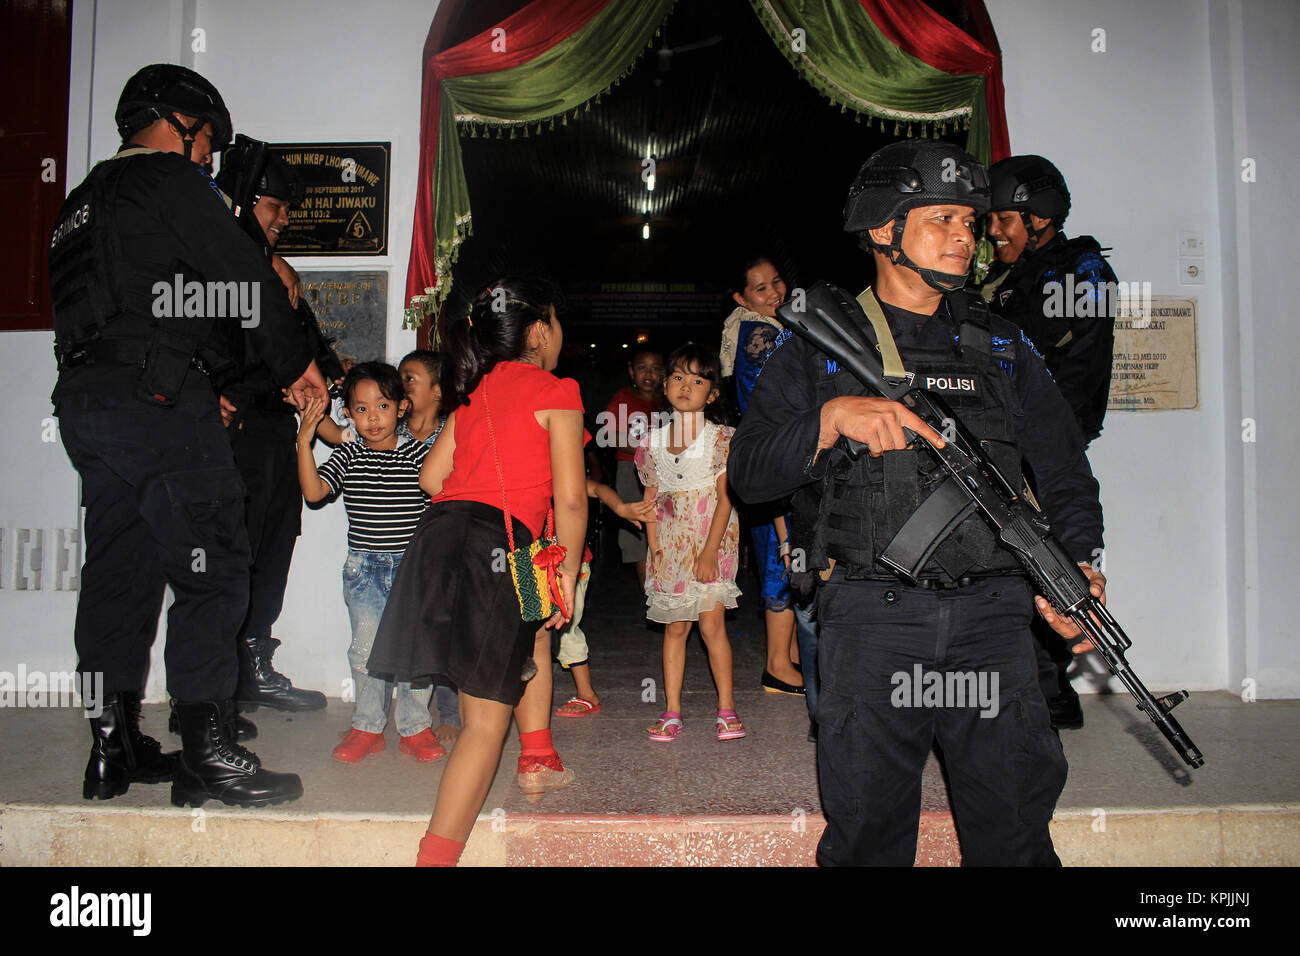 Police Indonesia Stockfotos & Police Indonesia Bilder - Seite 9 - Alamy